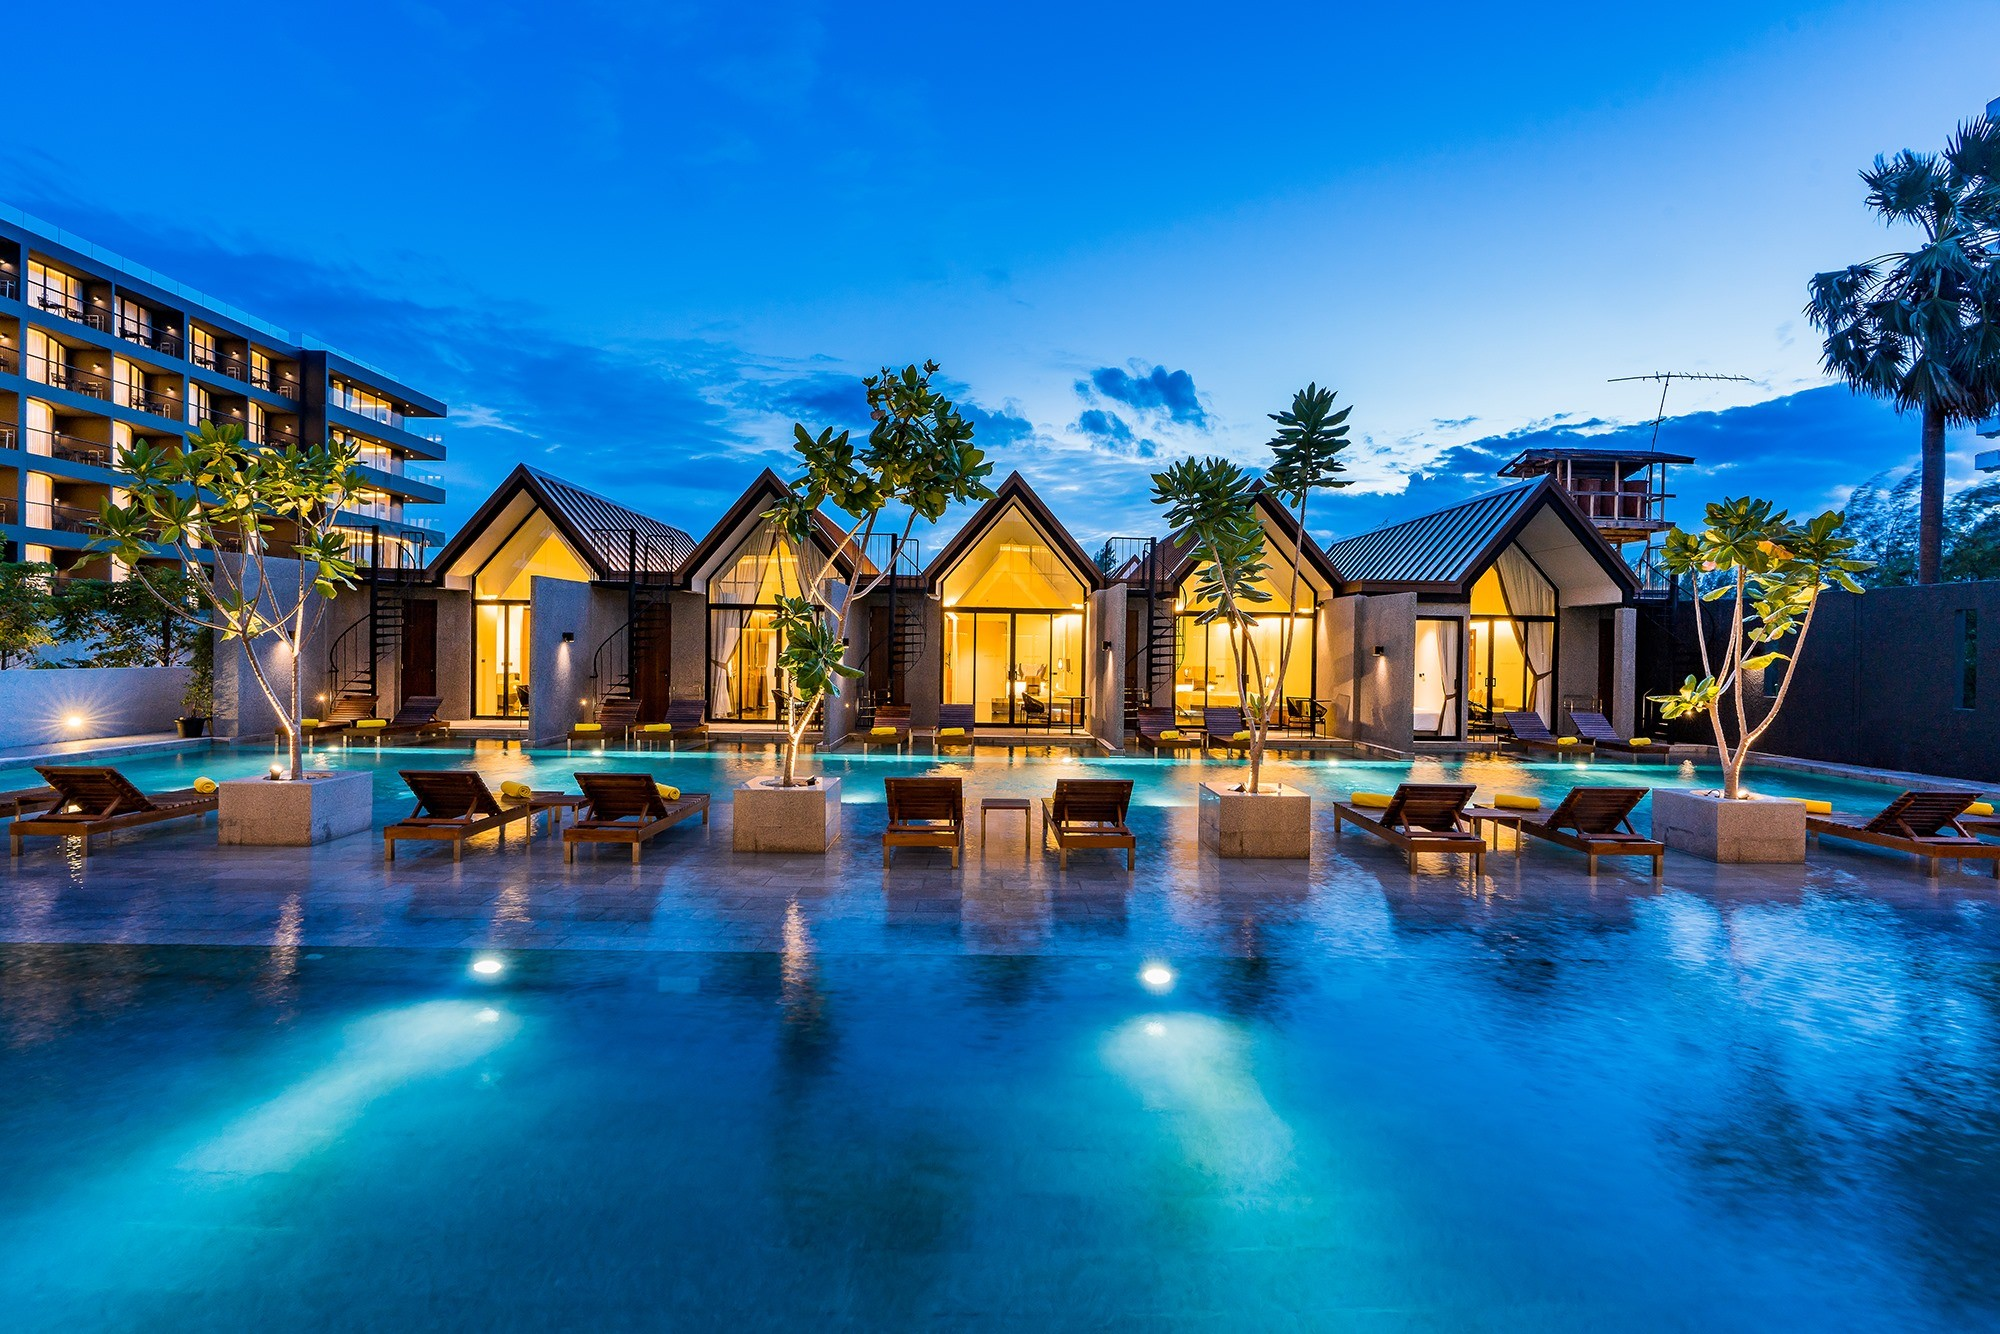 Ana Anan Resort & Villas Pattaya กับหลังคาระบบกันเสียงที่เงียบที่สุด